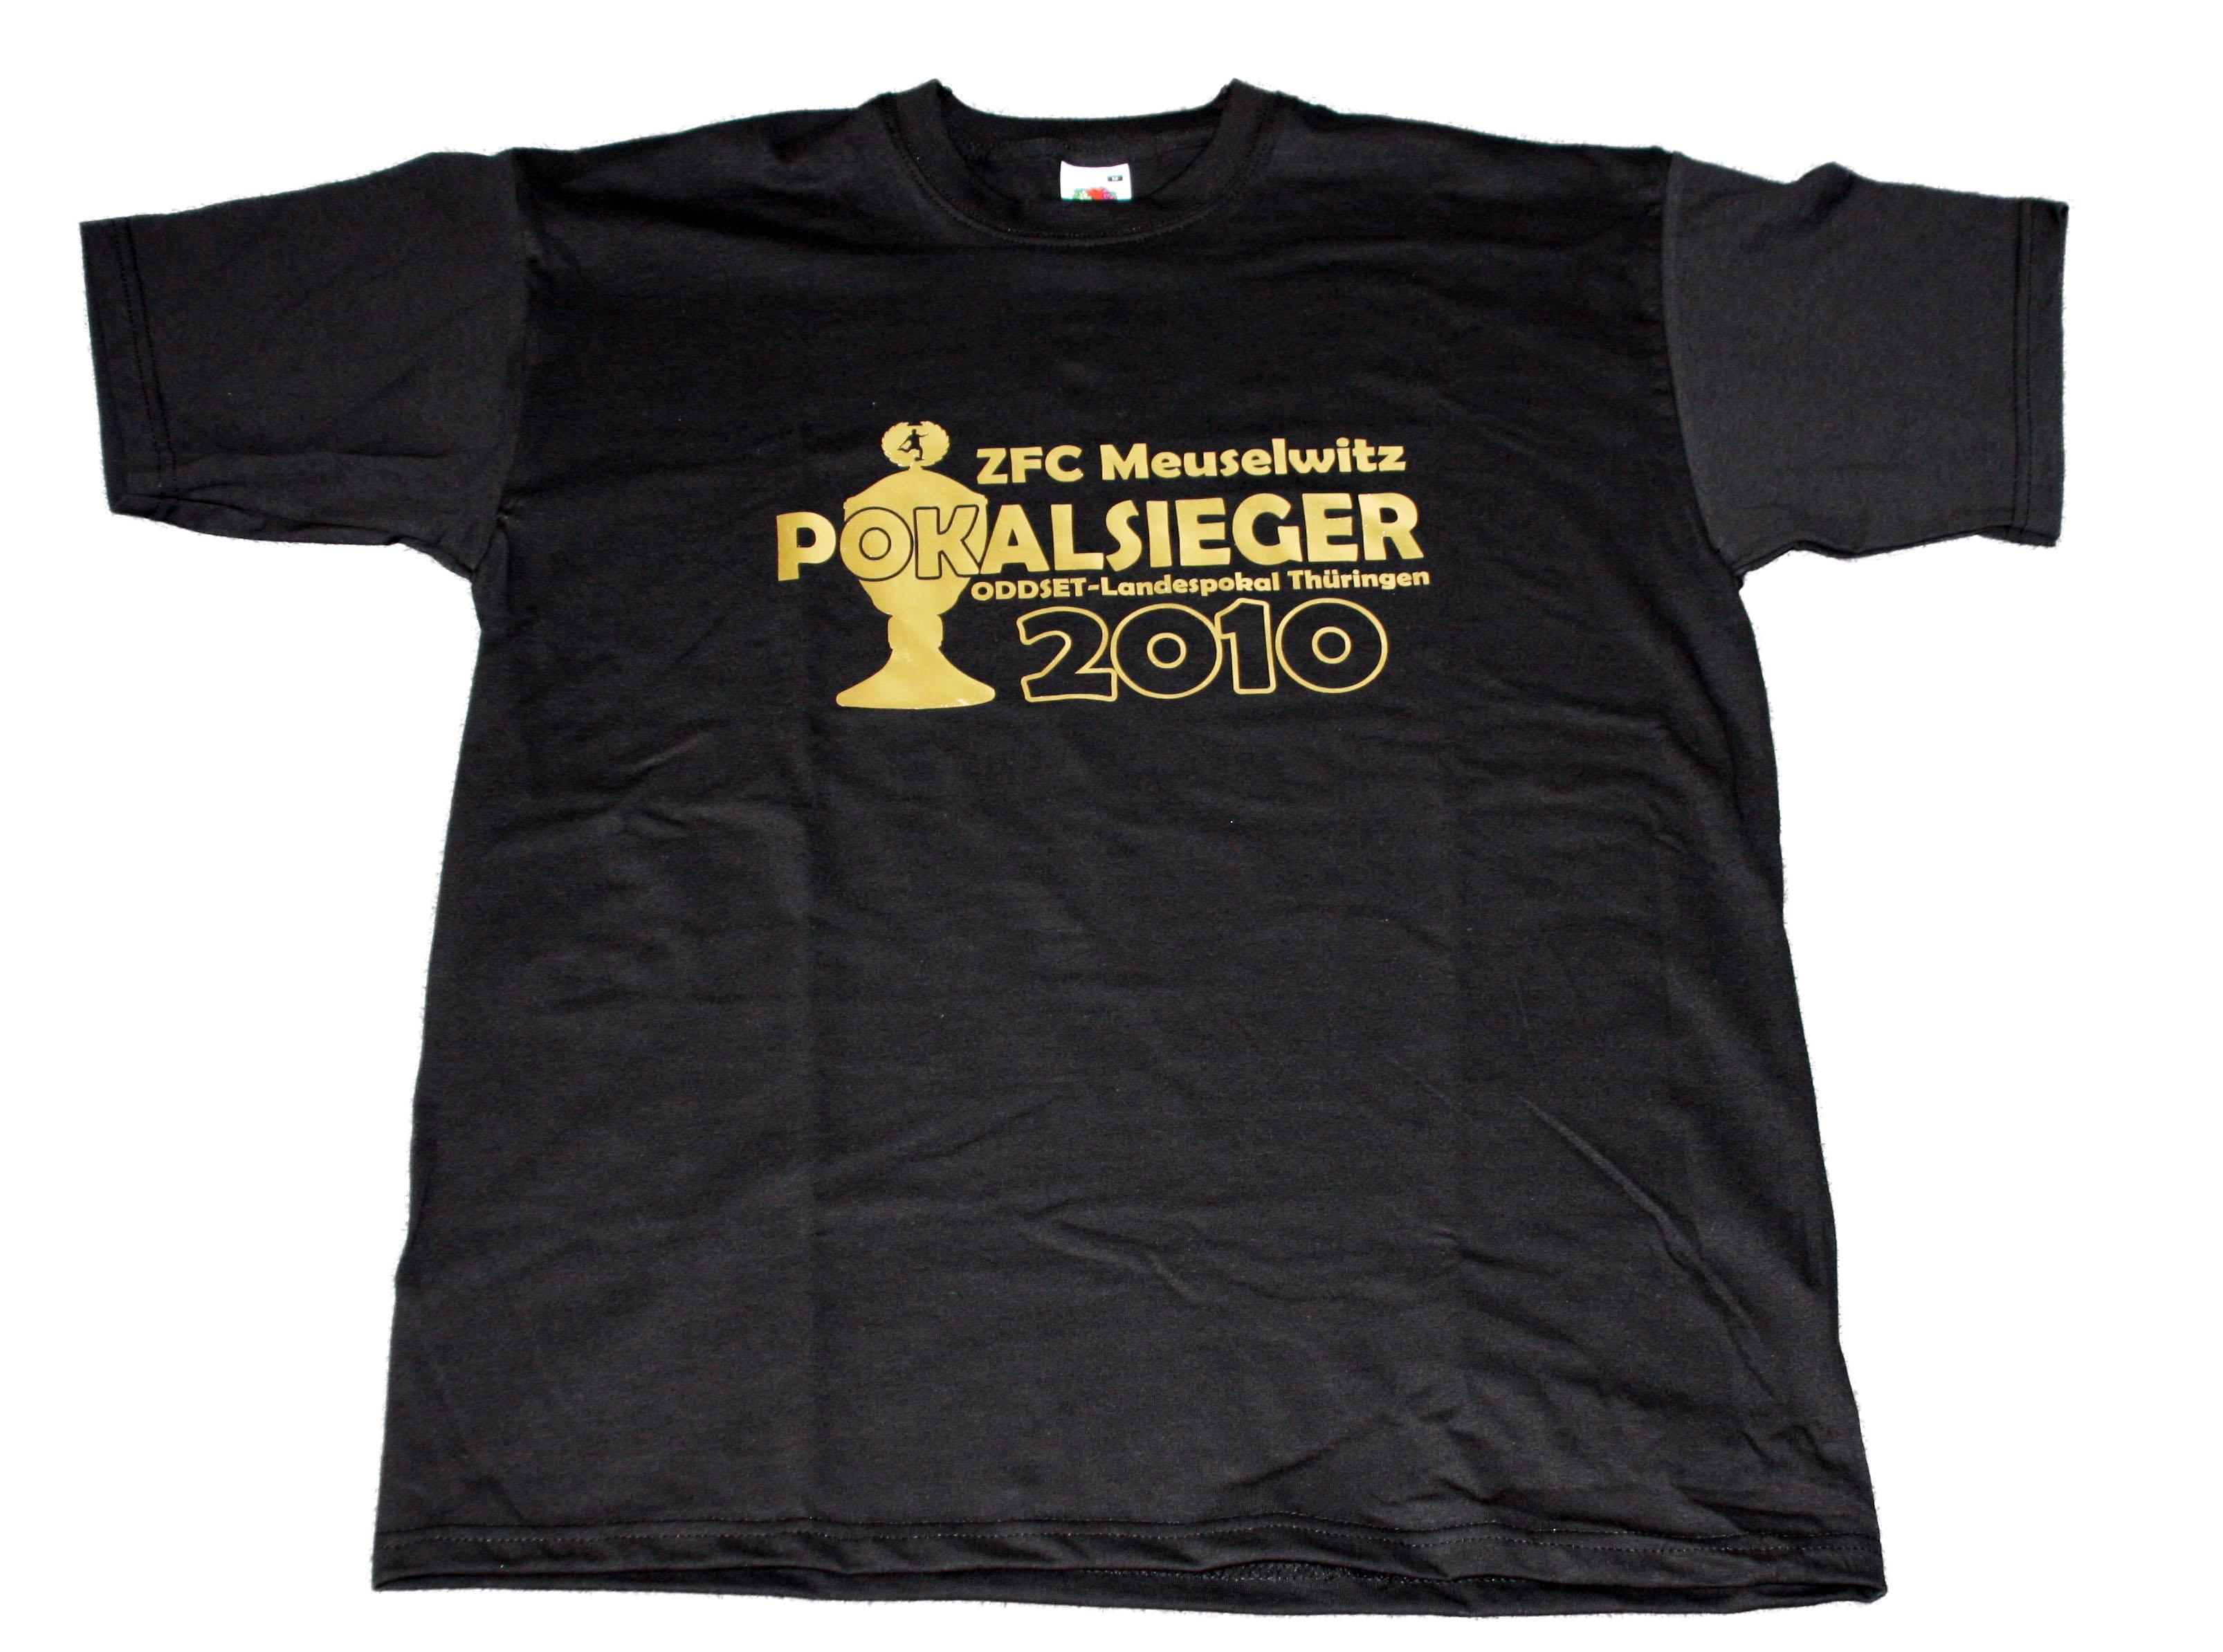 T-Shirt Landespokalsieger 2010